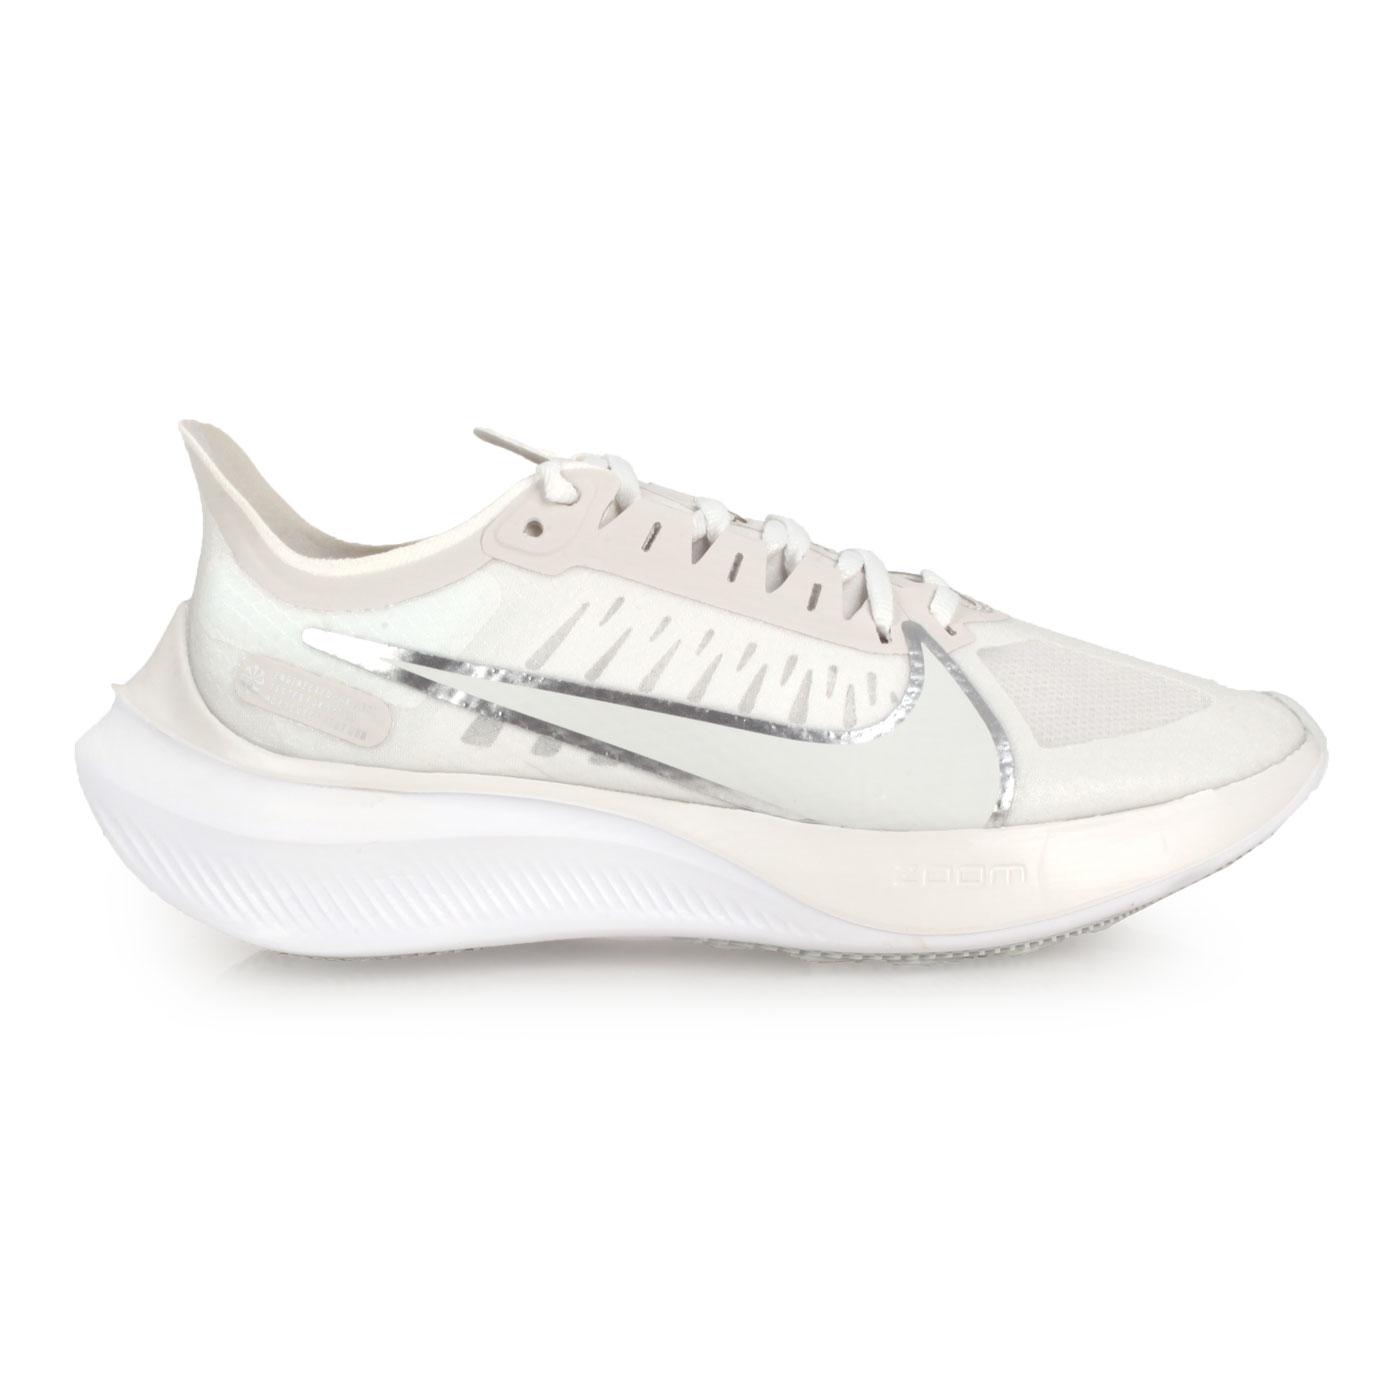 NIKE 女款慢跑鞋  @WMNS  ZOOM GRAVITY@BQ3203001 - 白銀